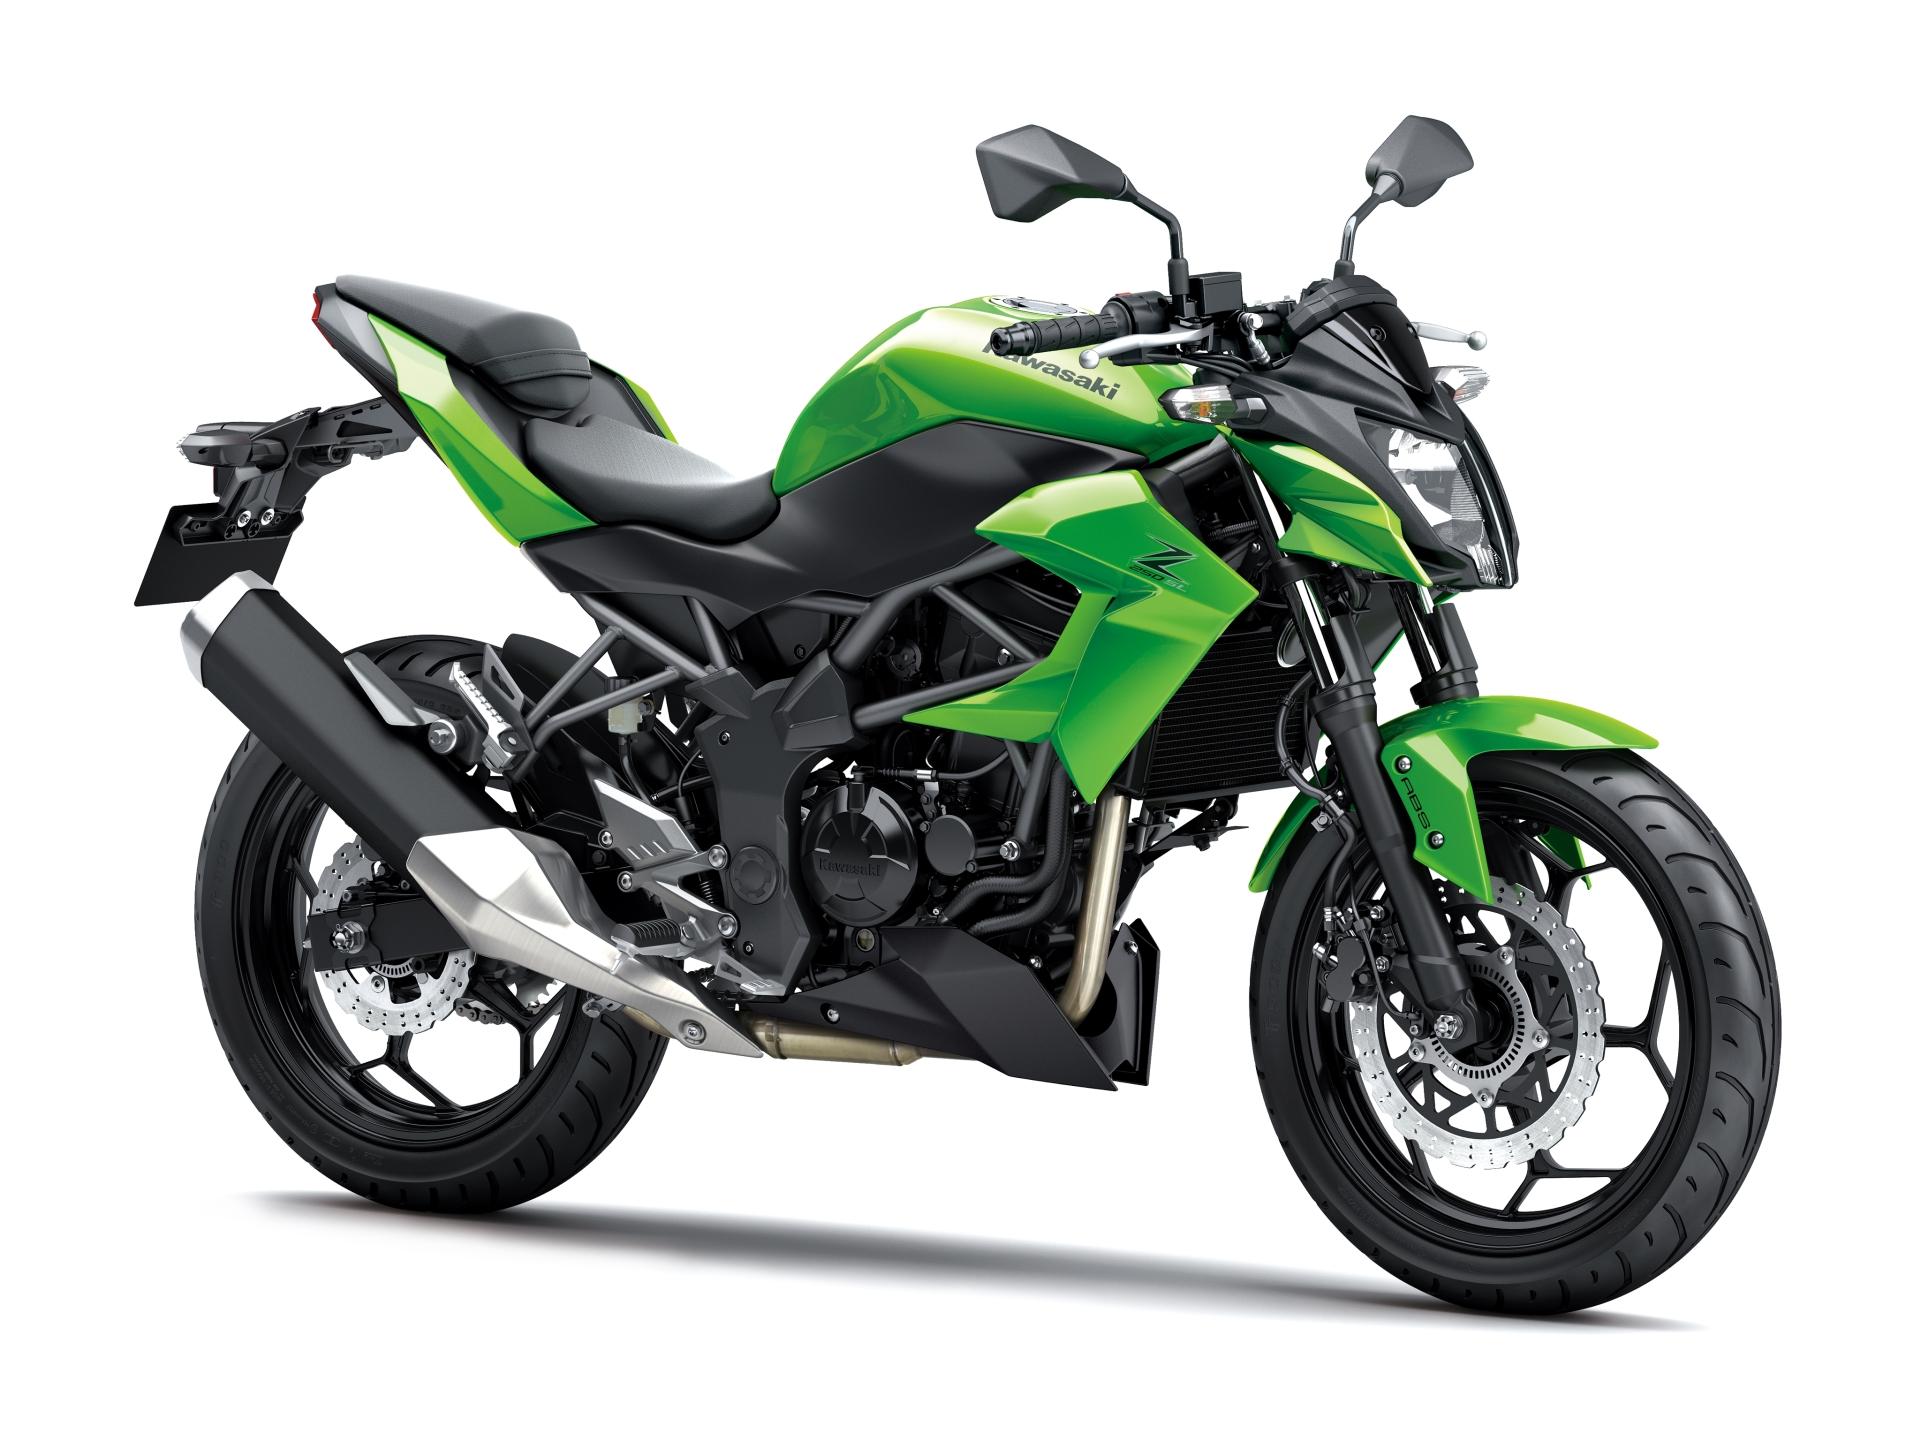 2015 Kawasaki Z250SL Spells Fun, but Not the NSFW Way ...